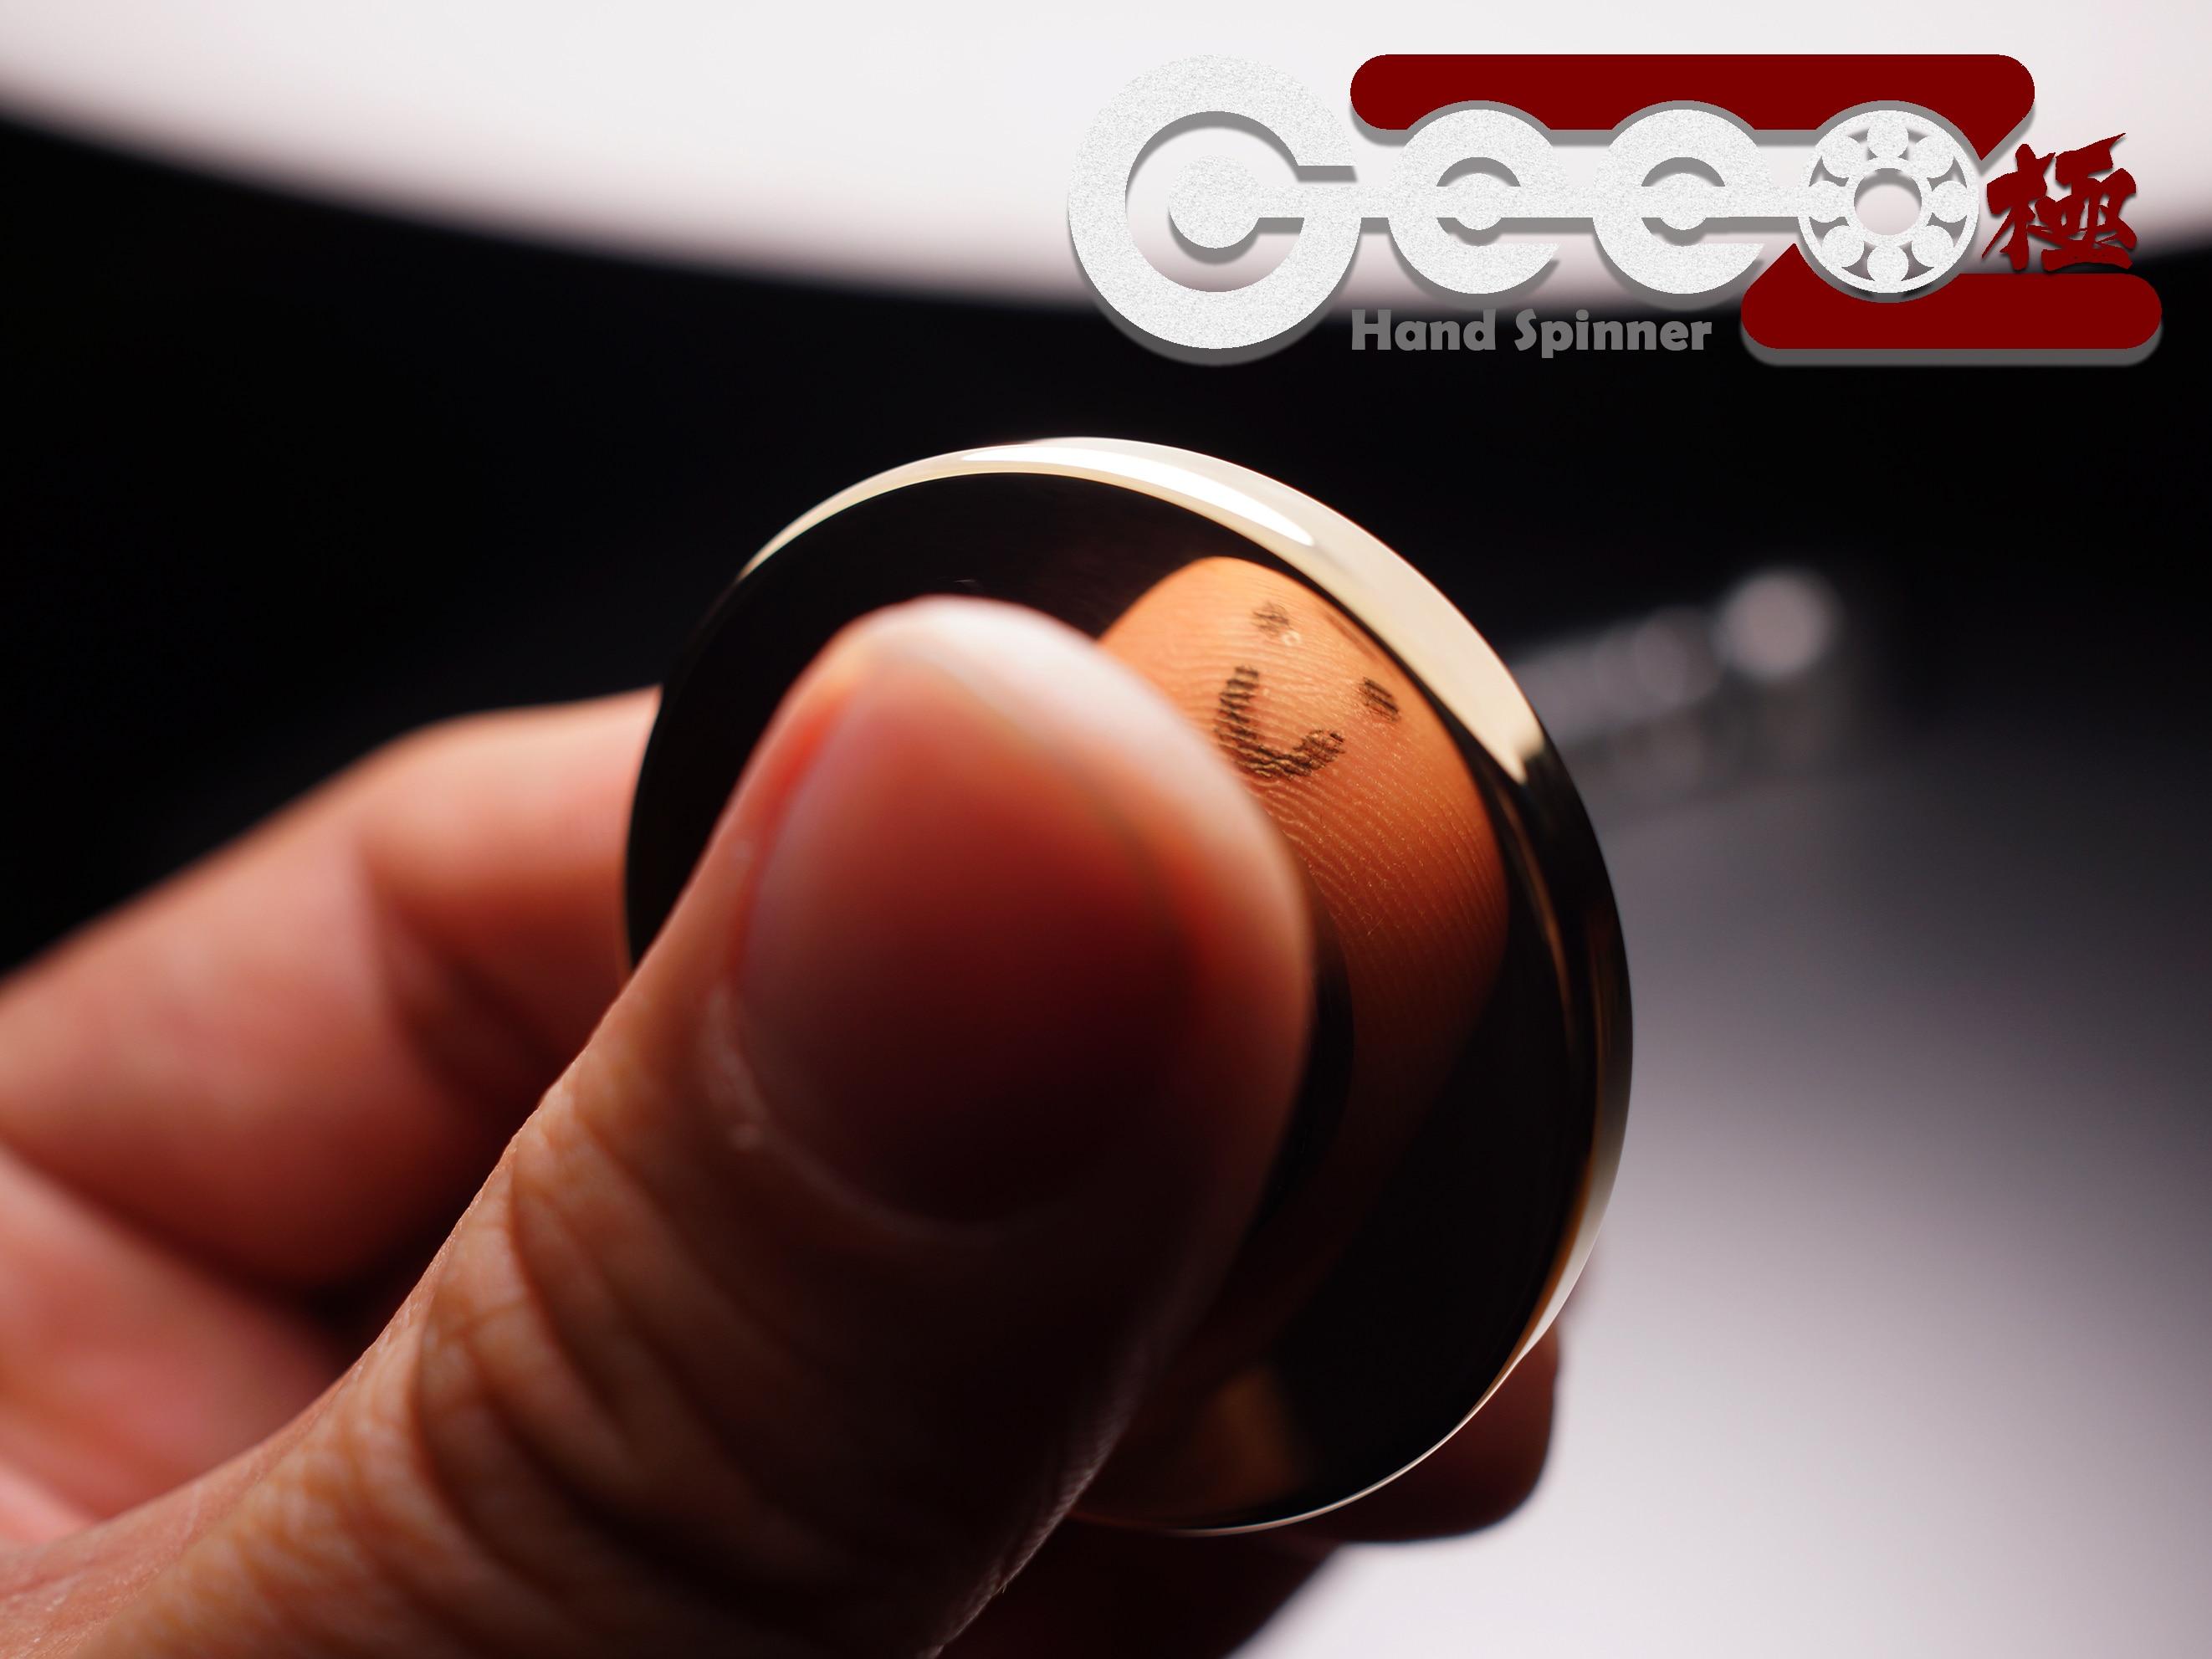 ФОТО 100% Metal Hand Spinner Cake 688 Ceramic Bearing EDC CNC Gyro Fidget HandSpinner Finger Top Desktop Game Decompression Toy